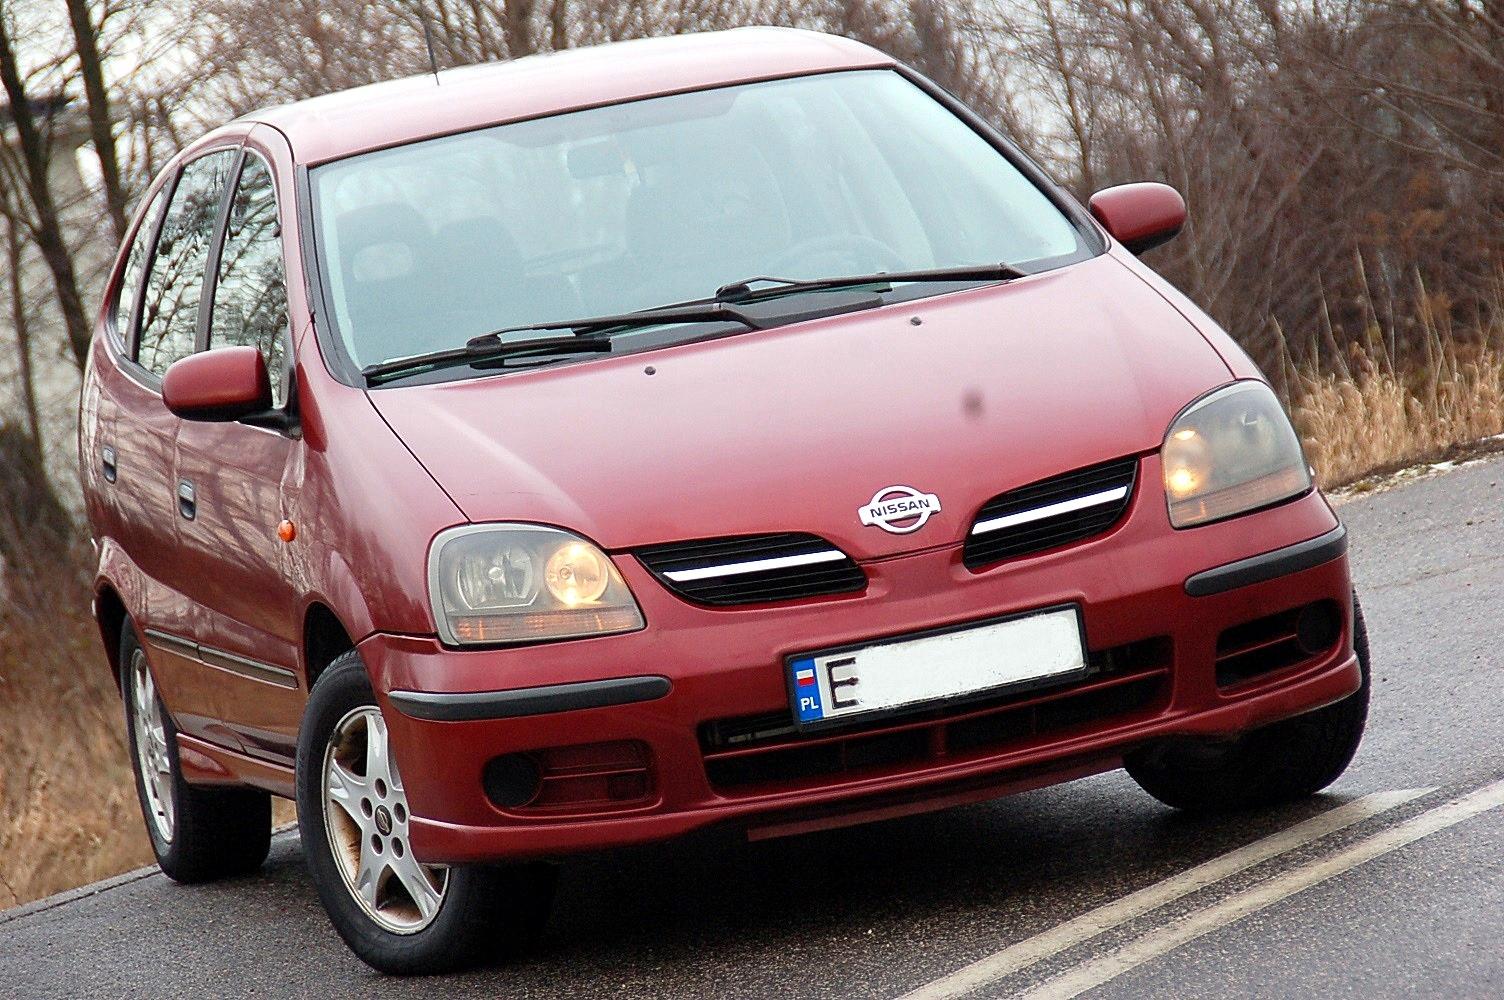 Nissan Almera Tino 1.8 16V 114KM+*GAZ SEKWENCJA*